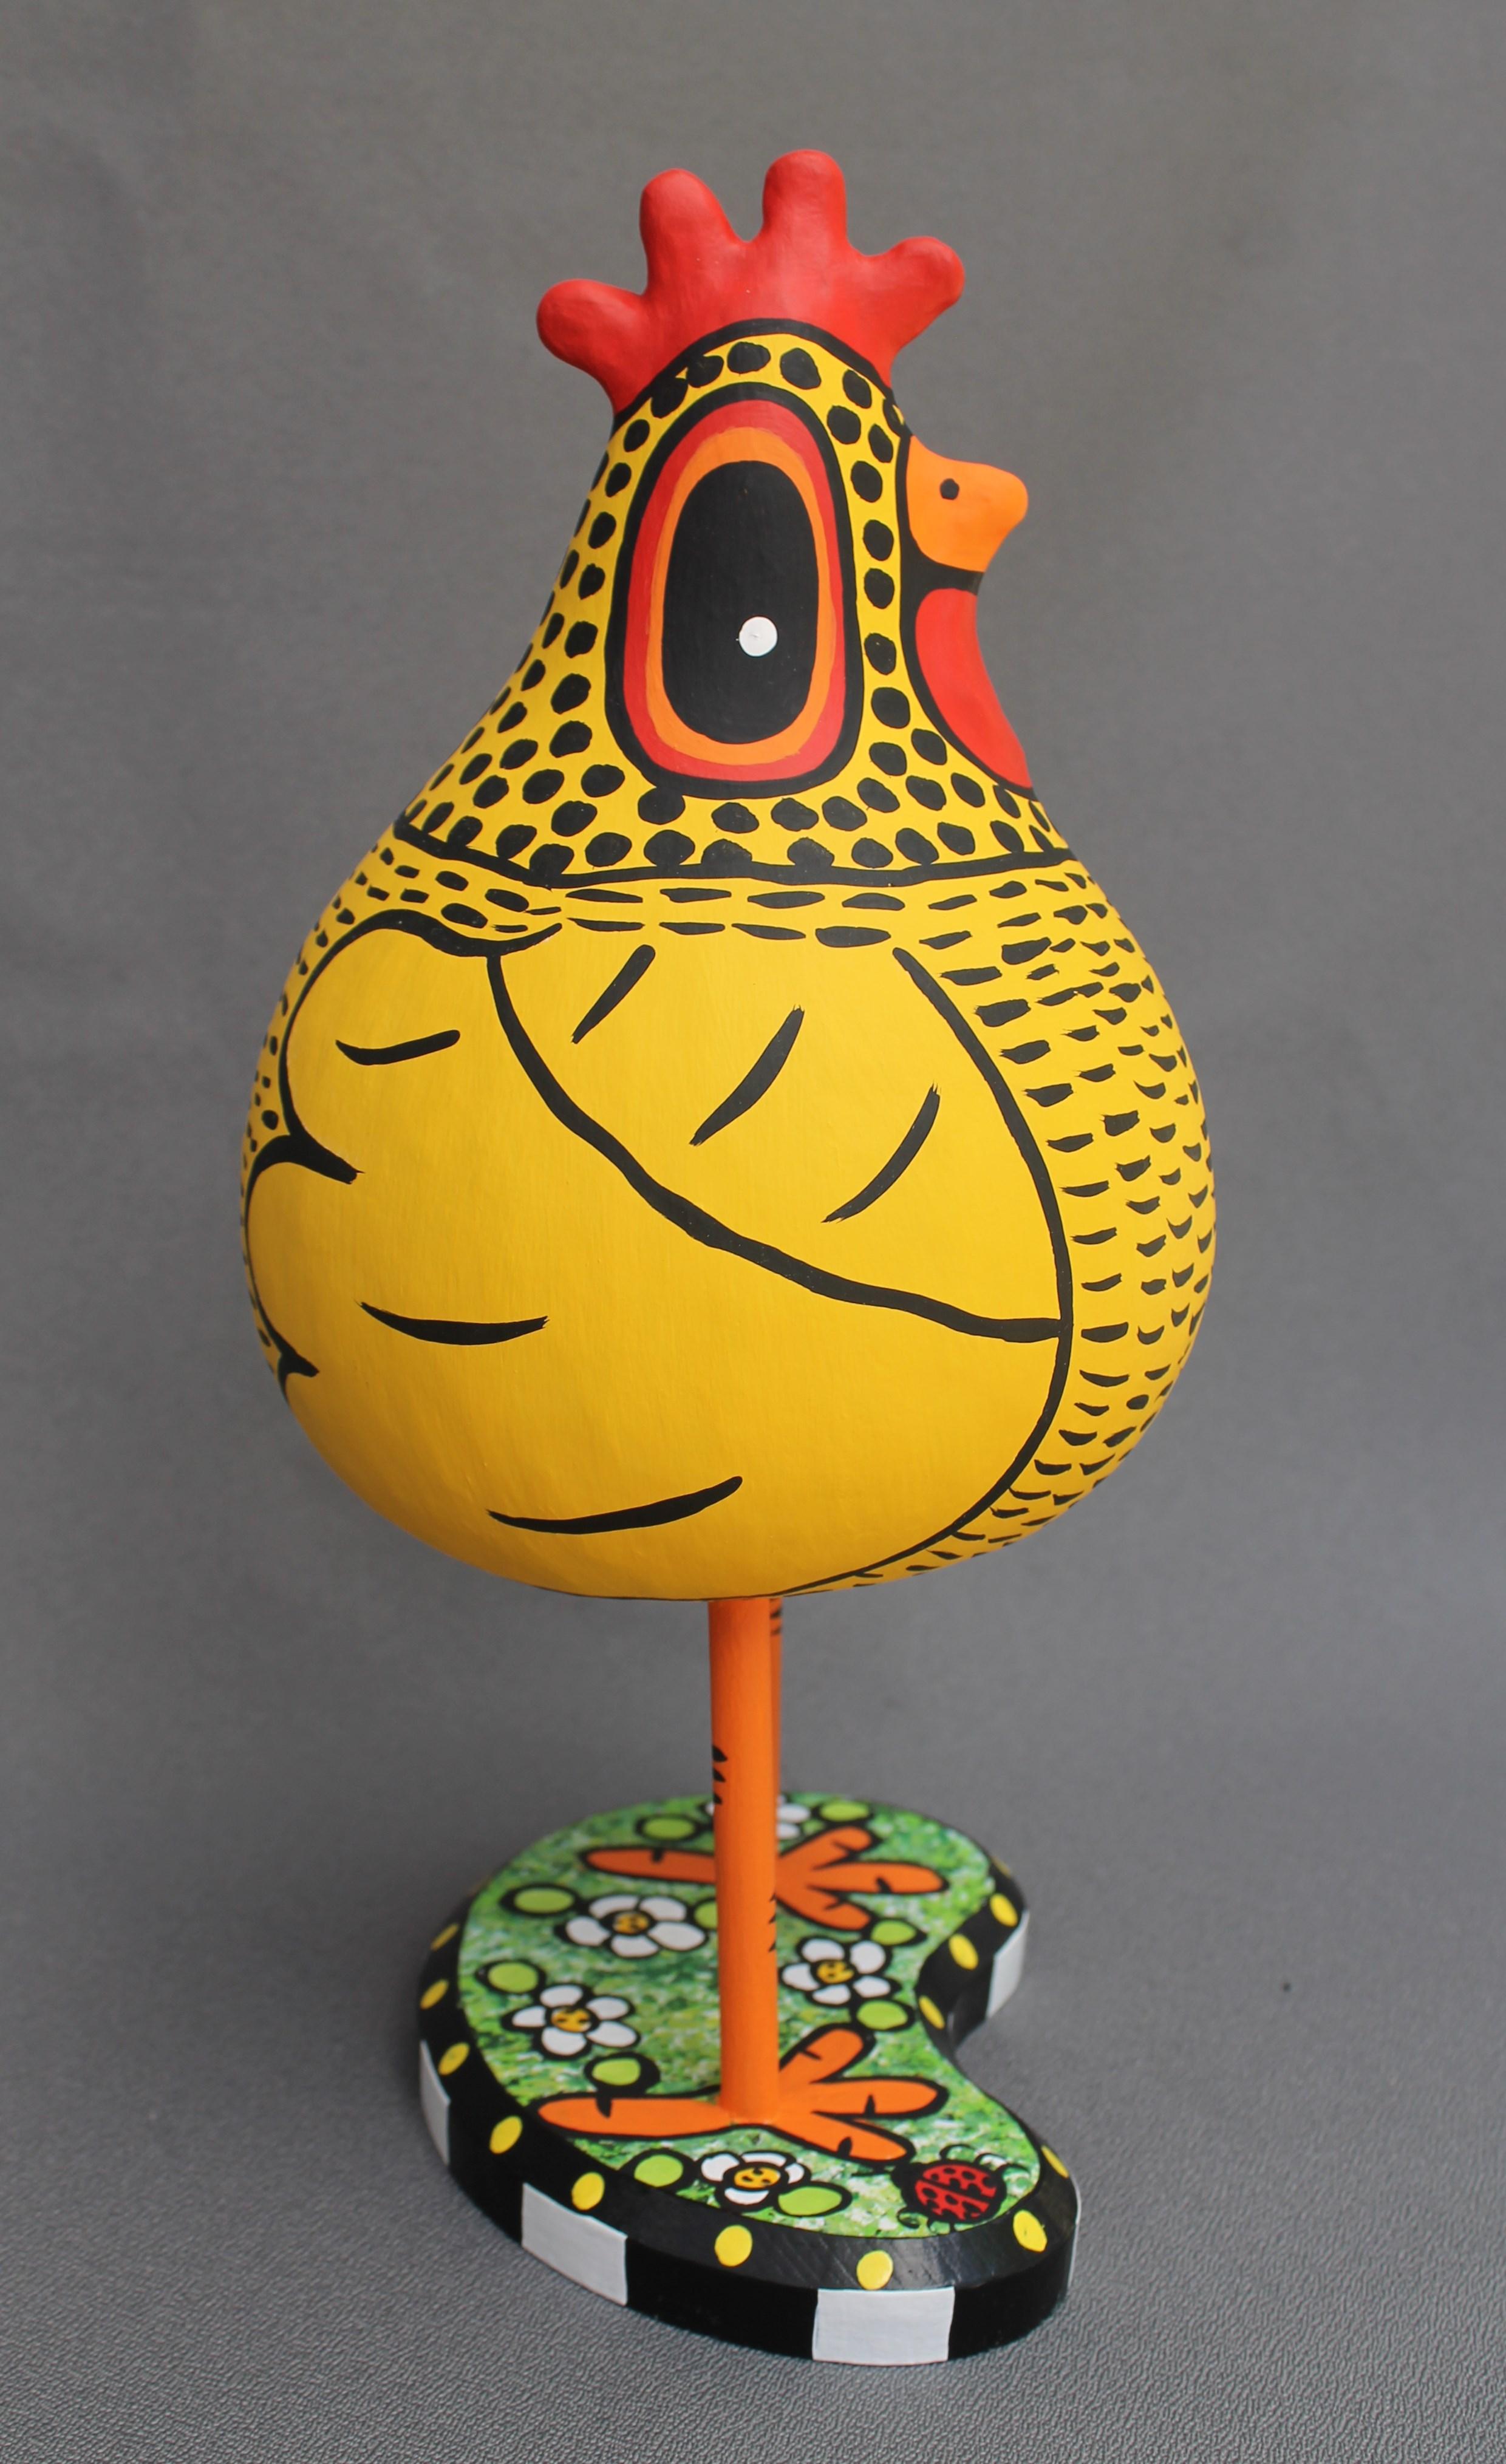 Yellow Gourd Kooky Chicken